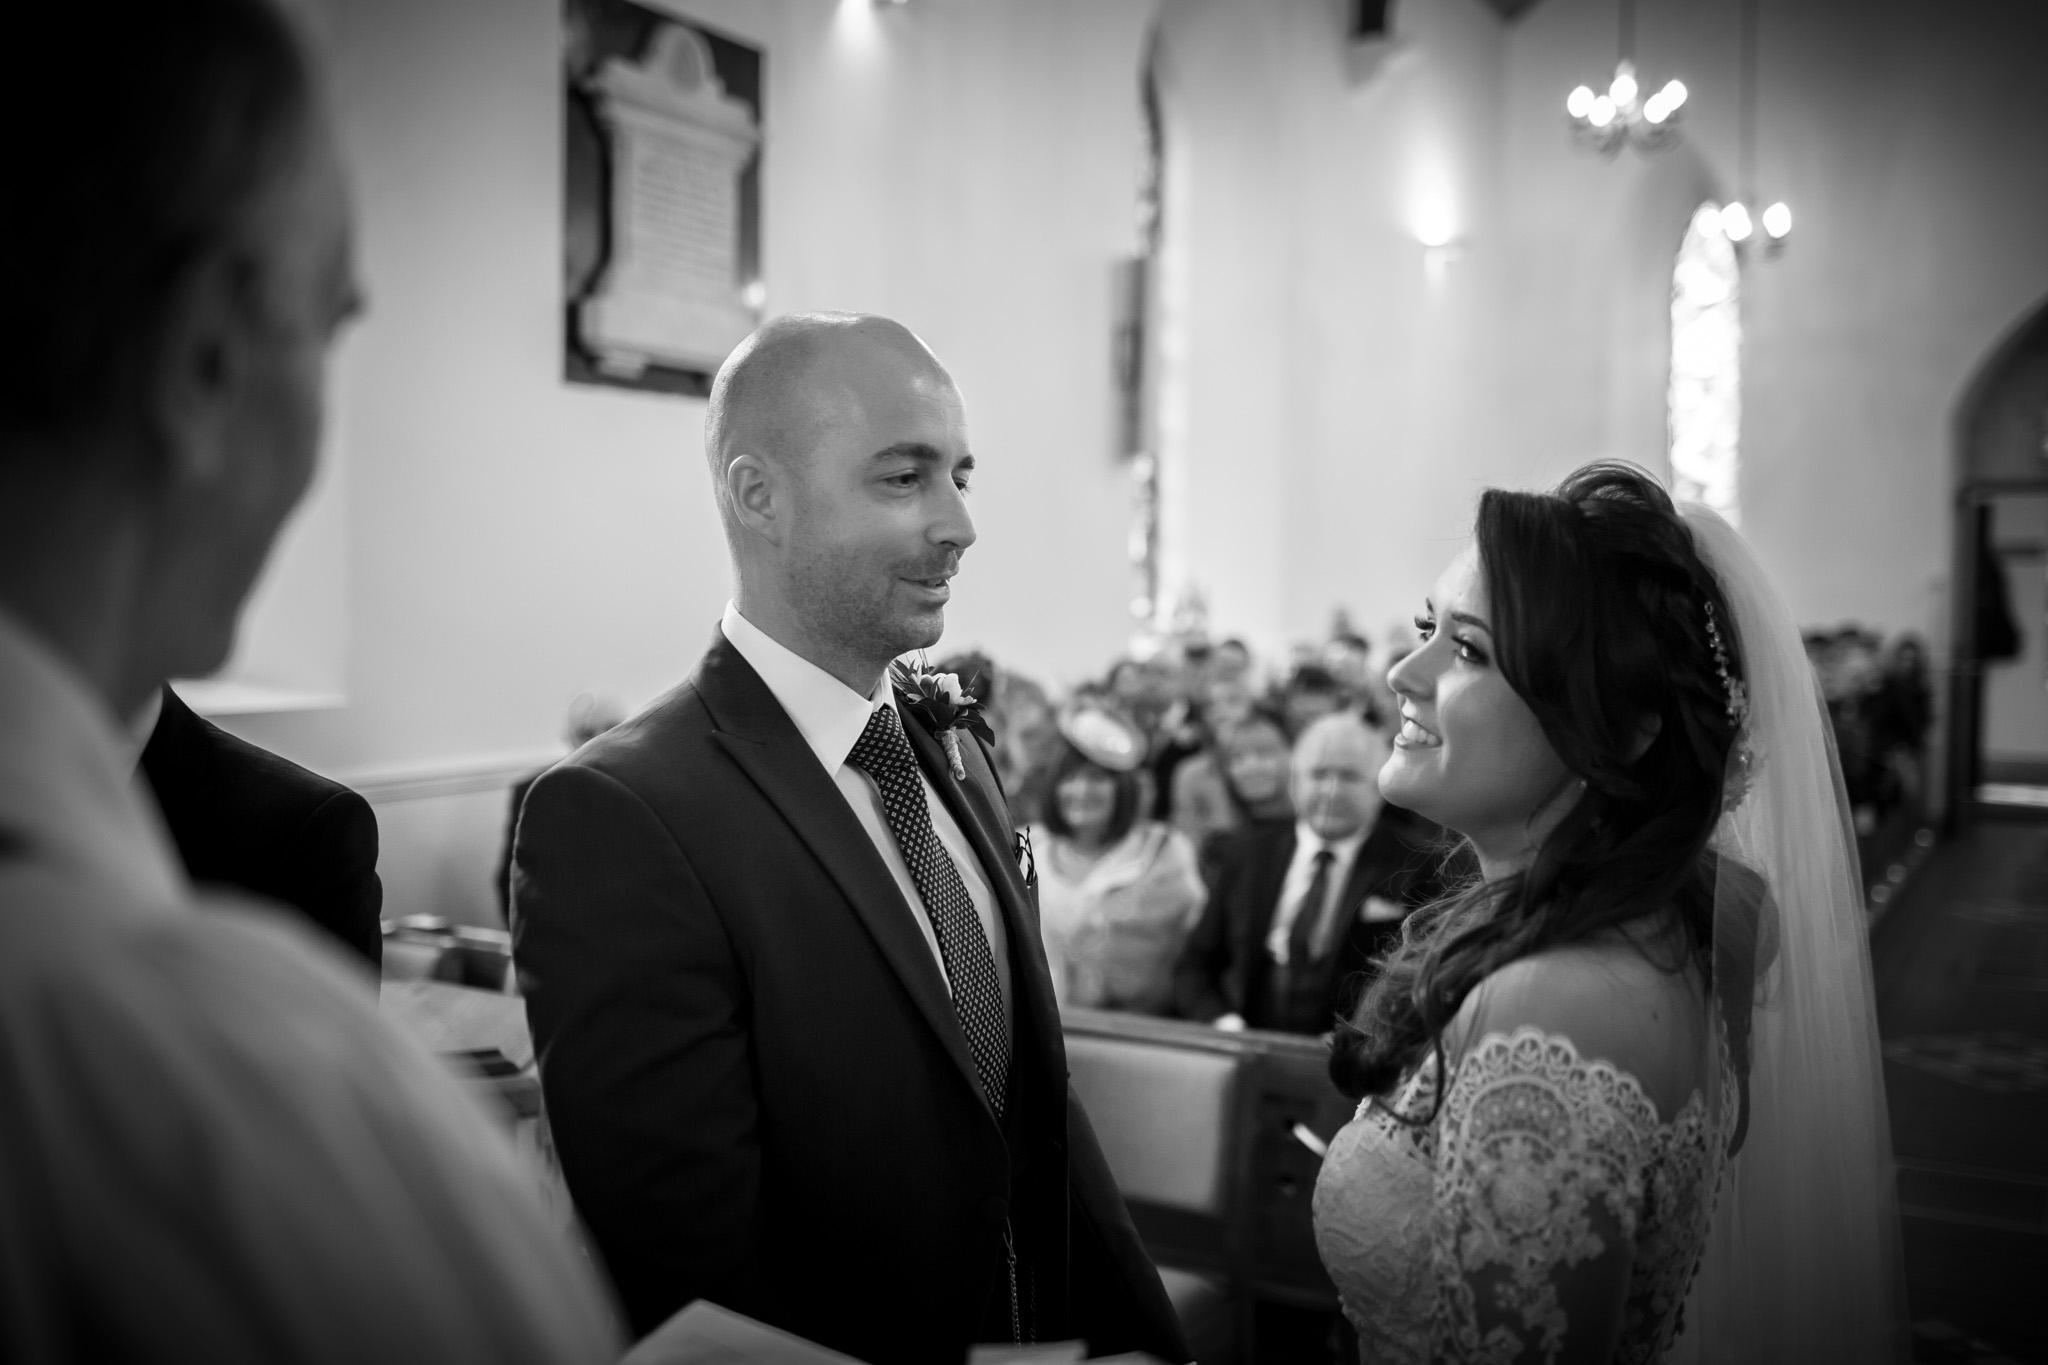 Mark_Barnes_Northern_Ireland_wedding_photographer_Harveys_Point_Donegall_Wedding_photography-Adam&Gemma-21.jpg